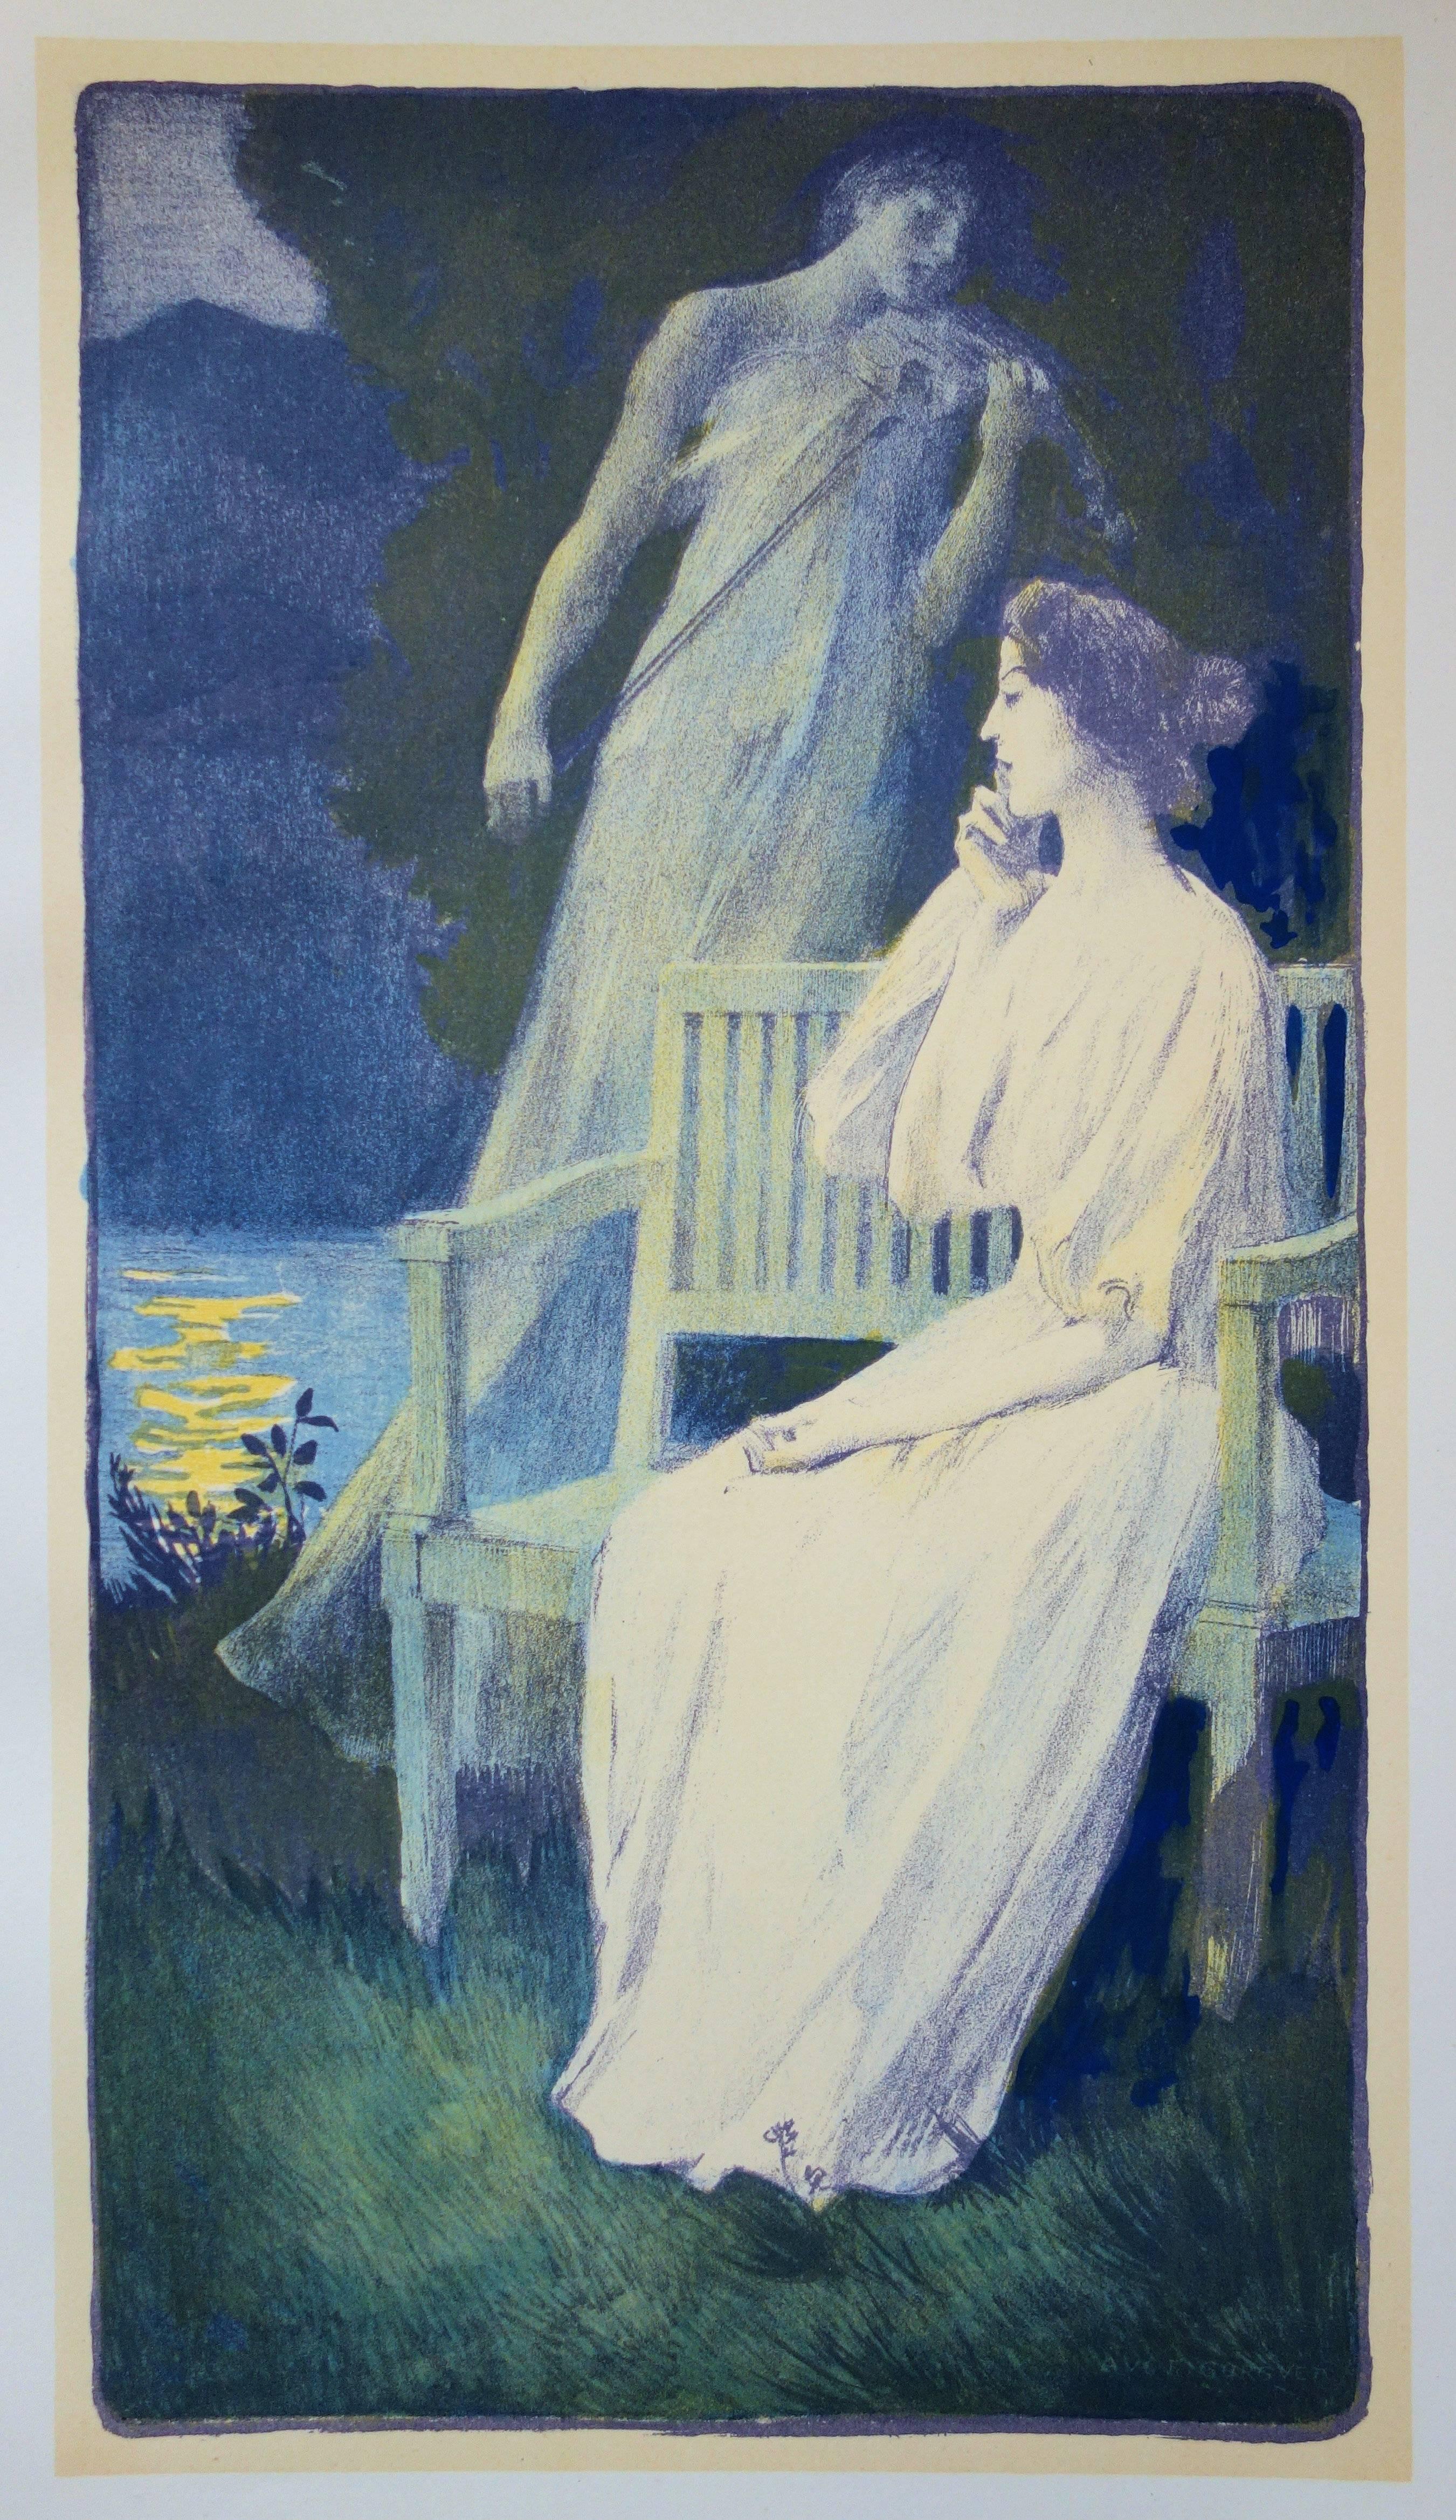 Night Andante - original lithograph (1897-1898)